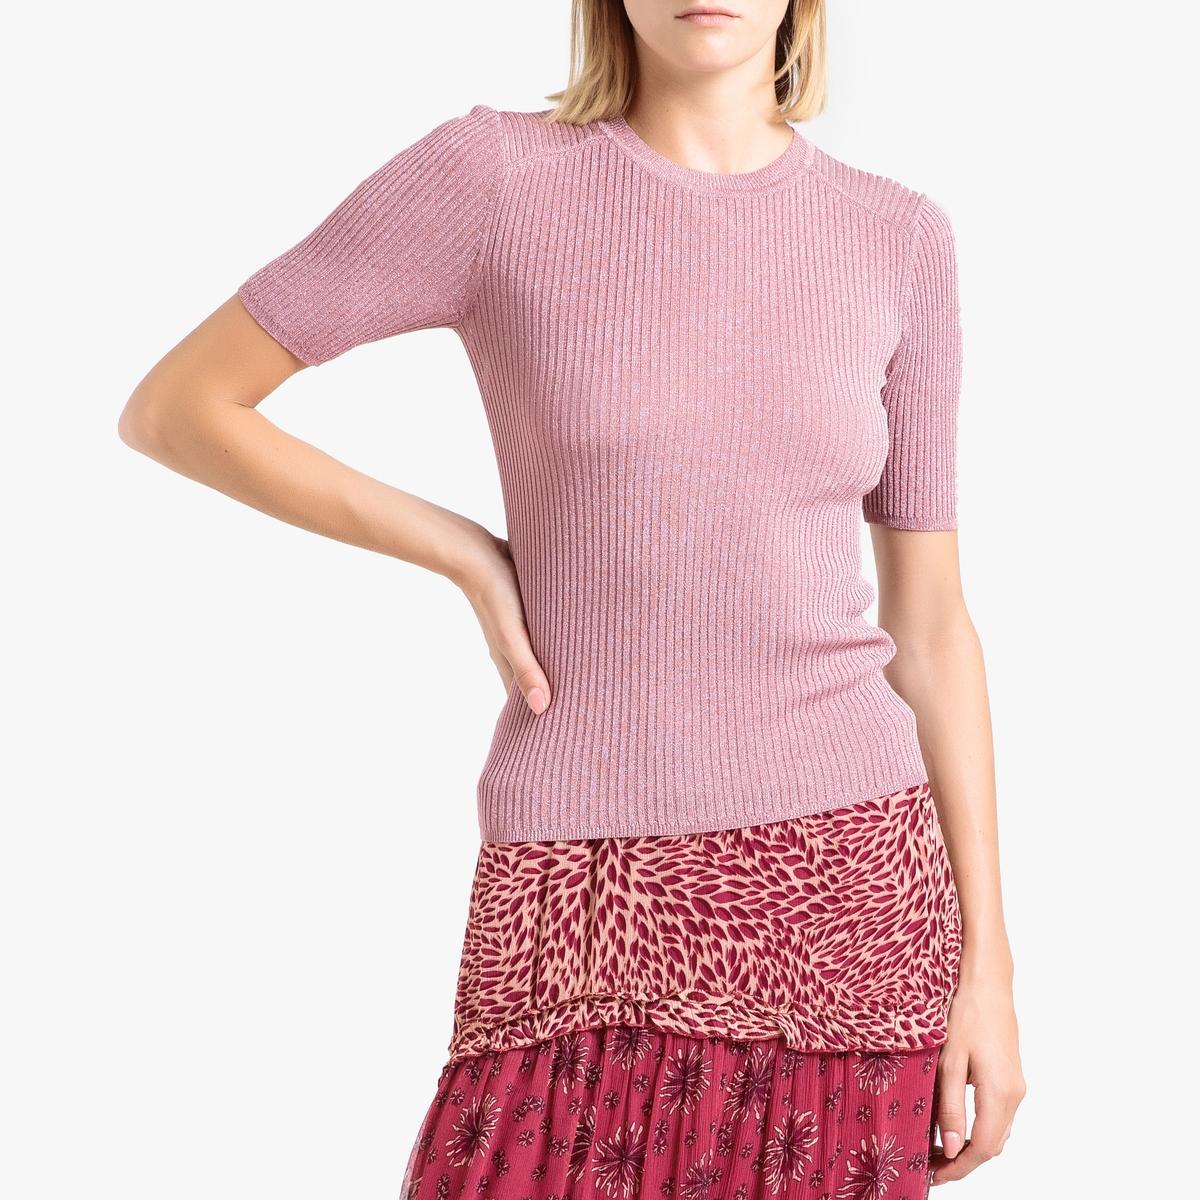 цена Пуловер La Redoute С круглым вырезом из тонкого трикотажа ZOE 0(XS) розовый